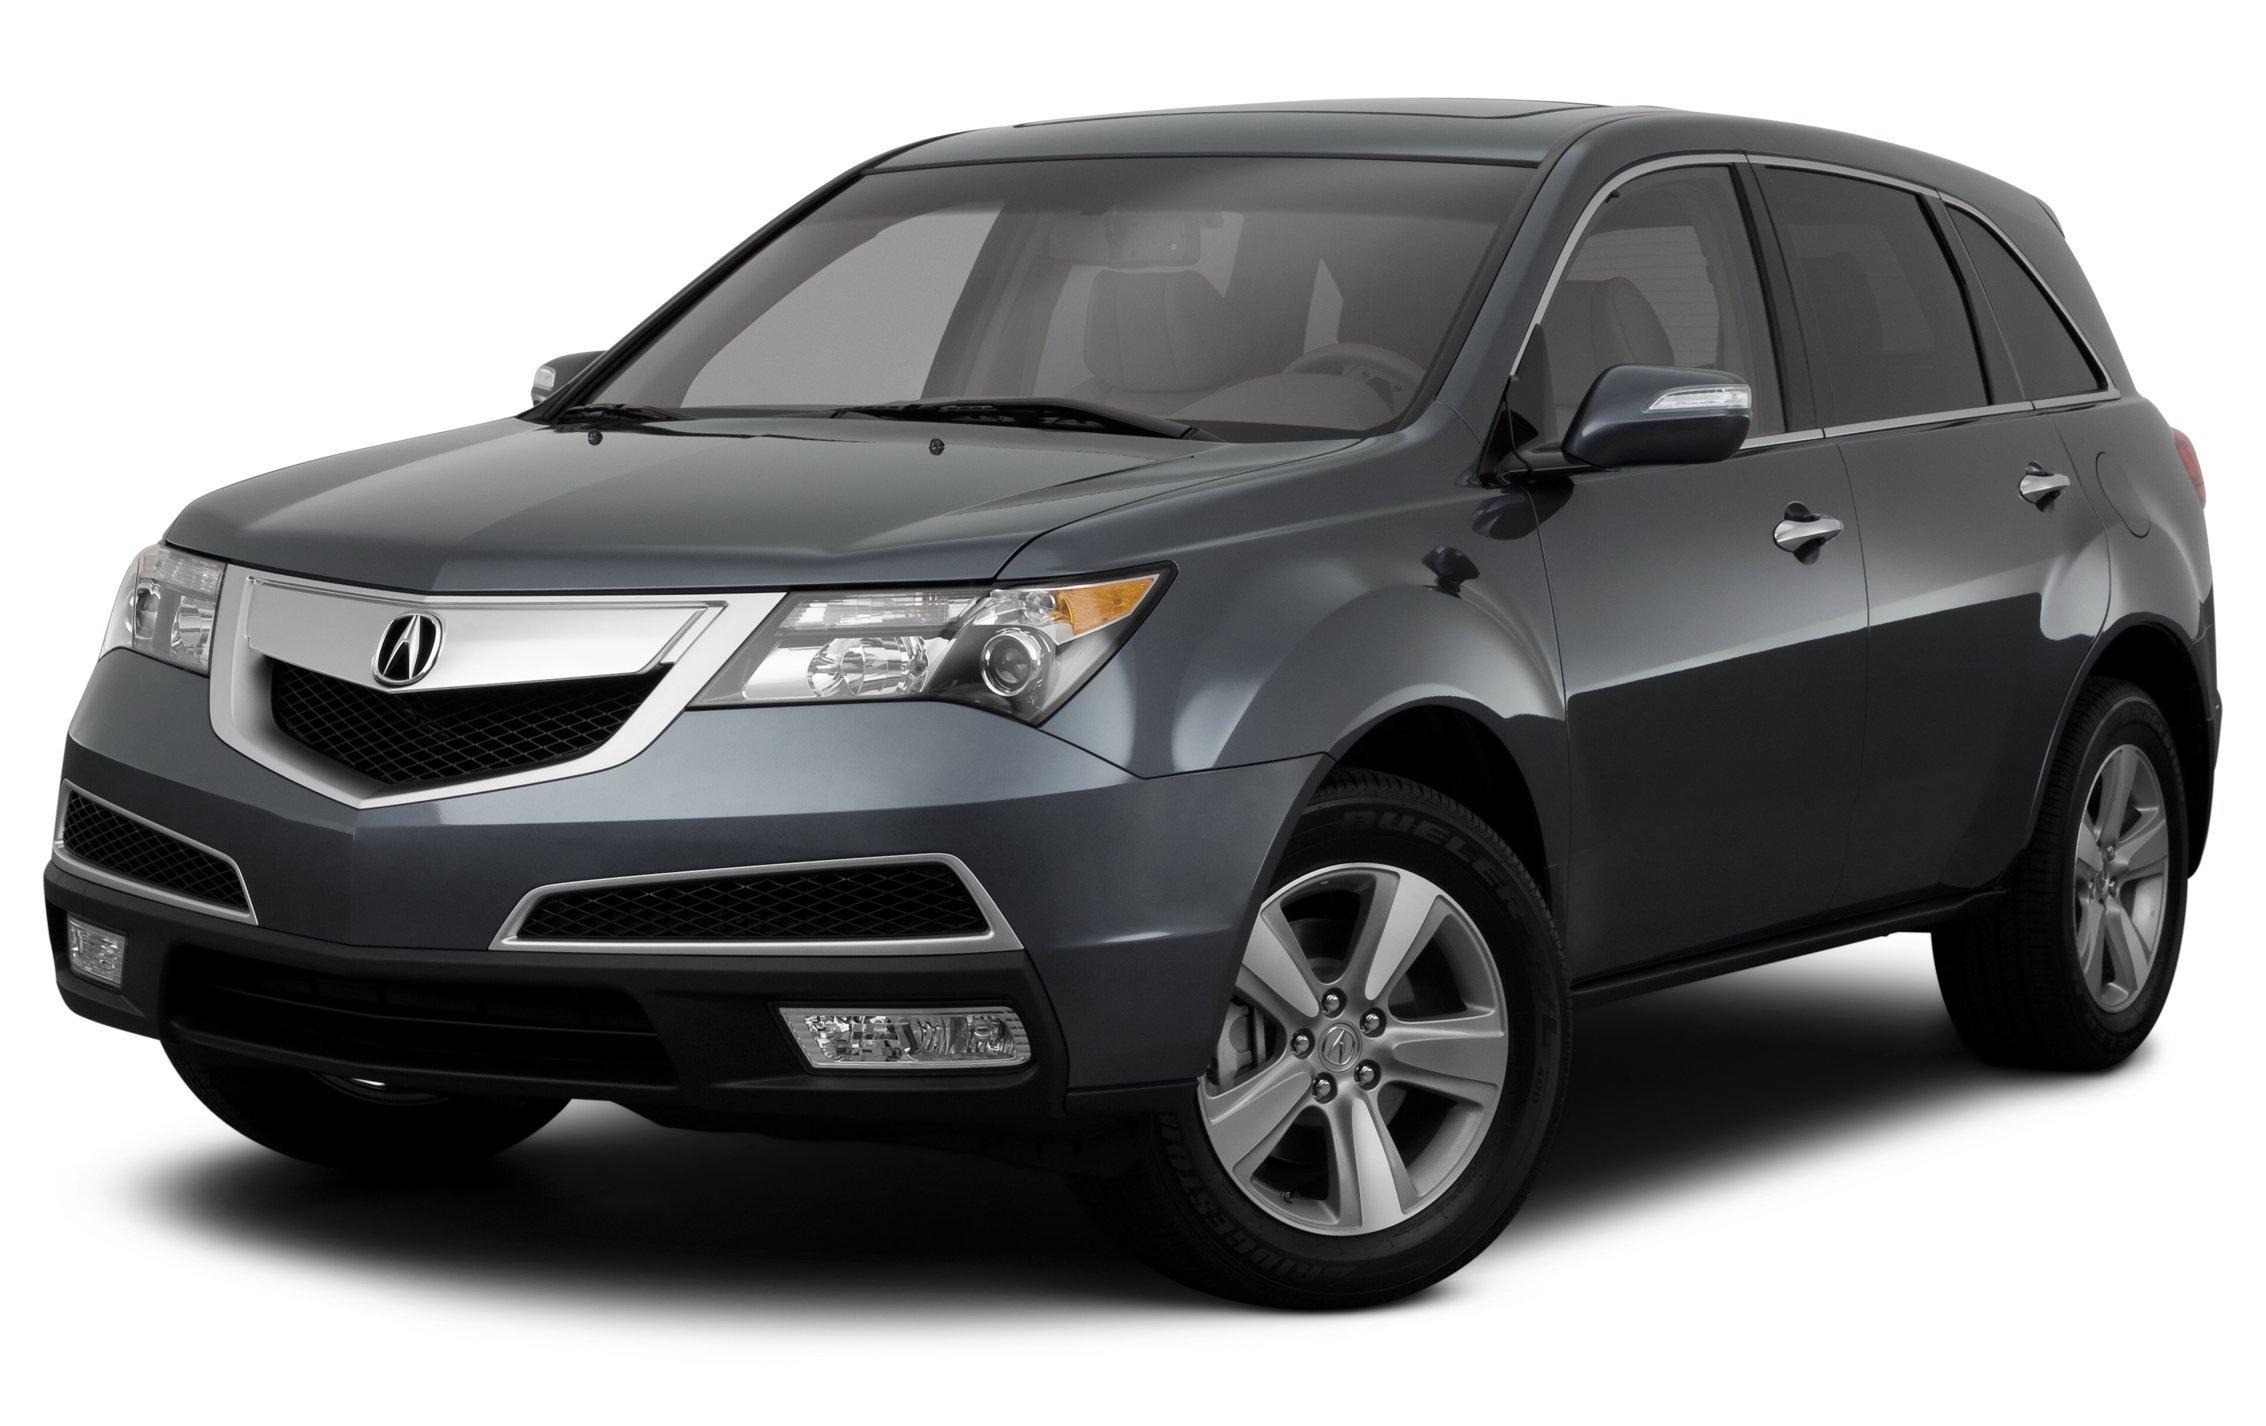 Amazon 2011 Acura MDX Reviews and Specs Vehicles